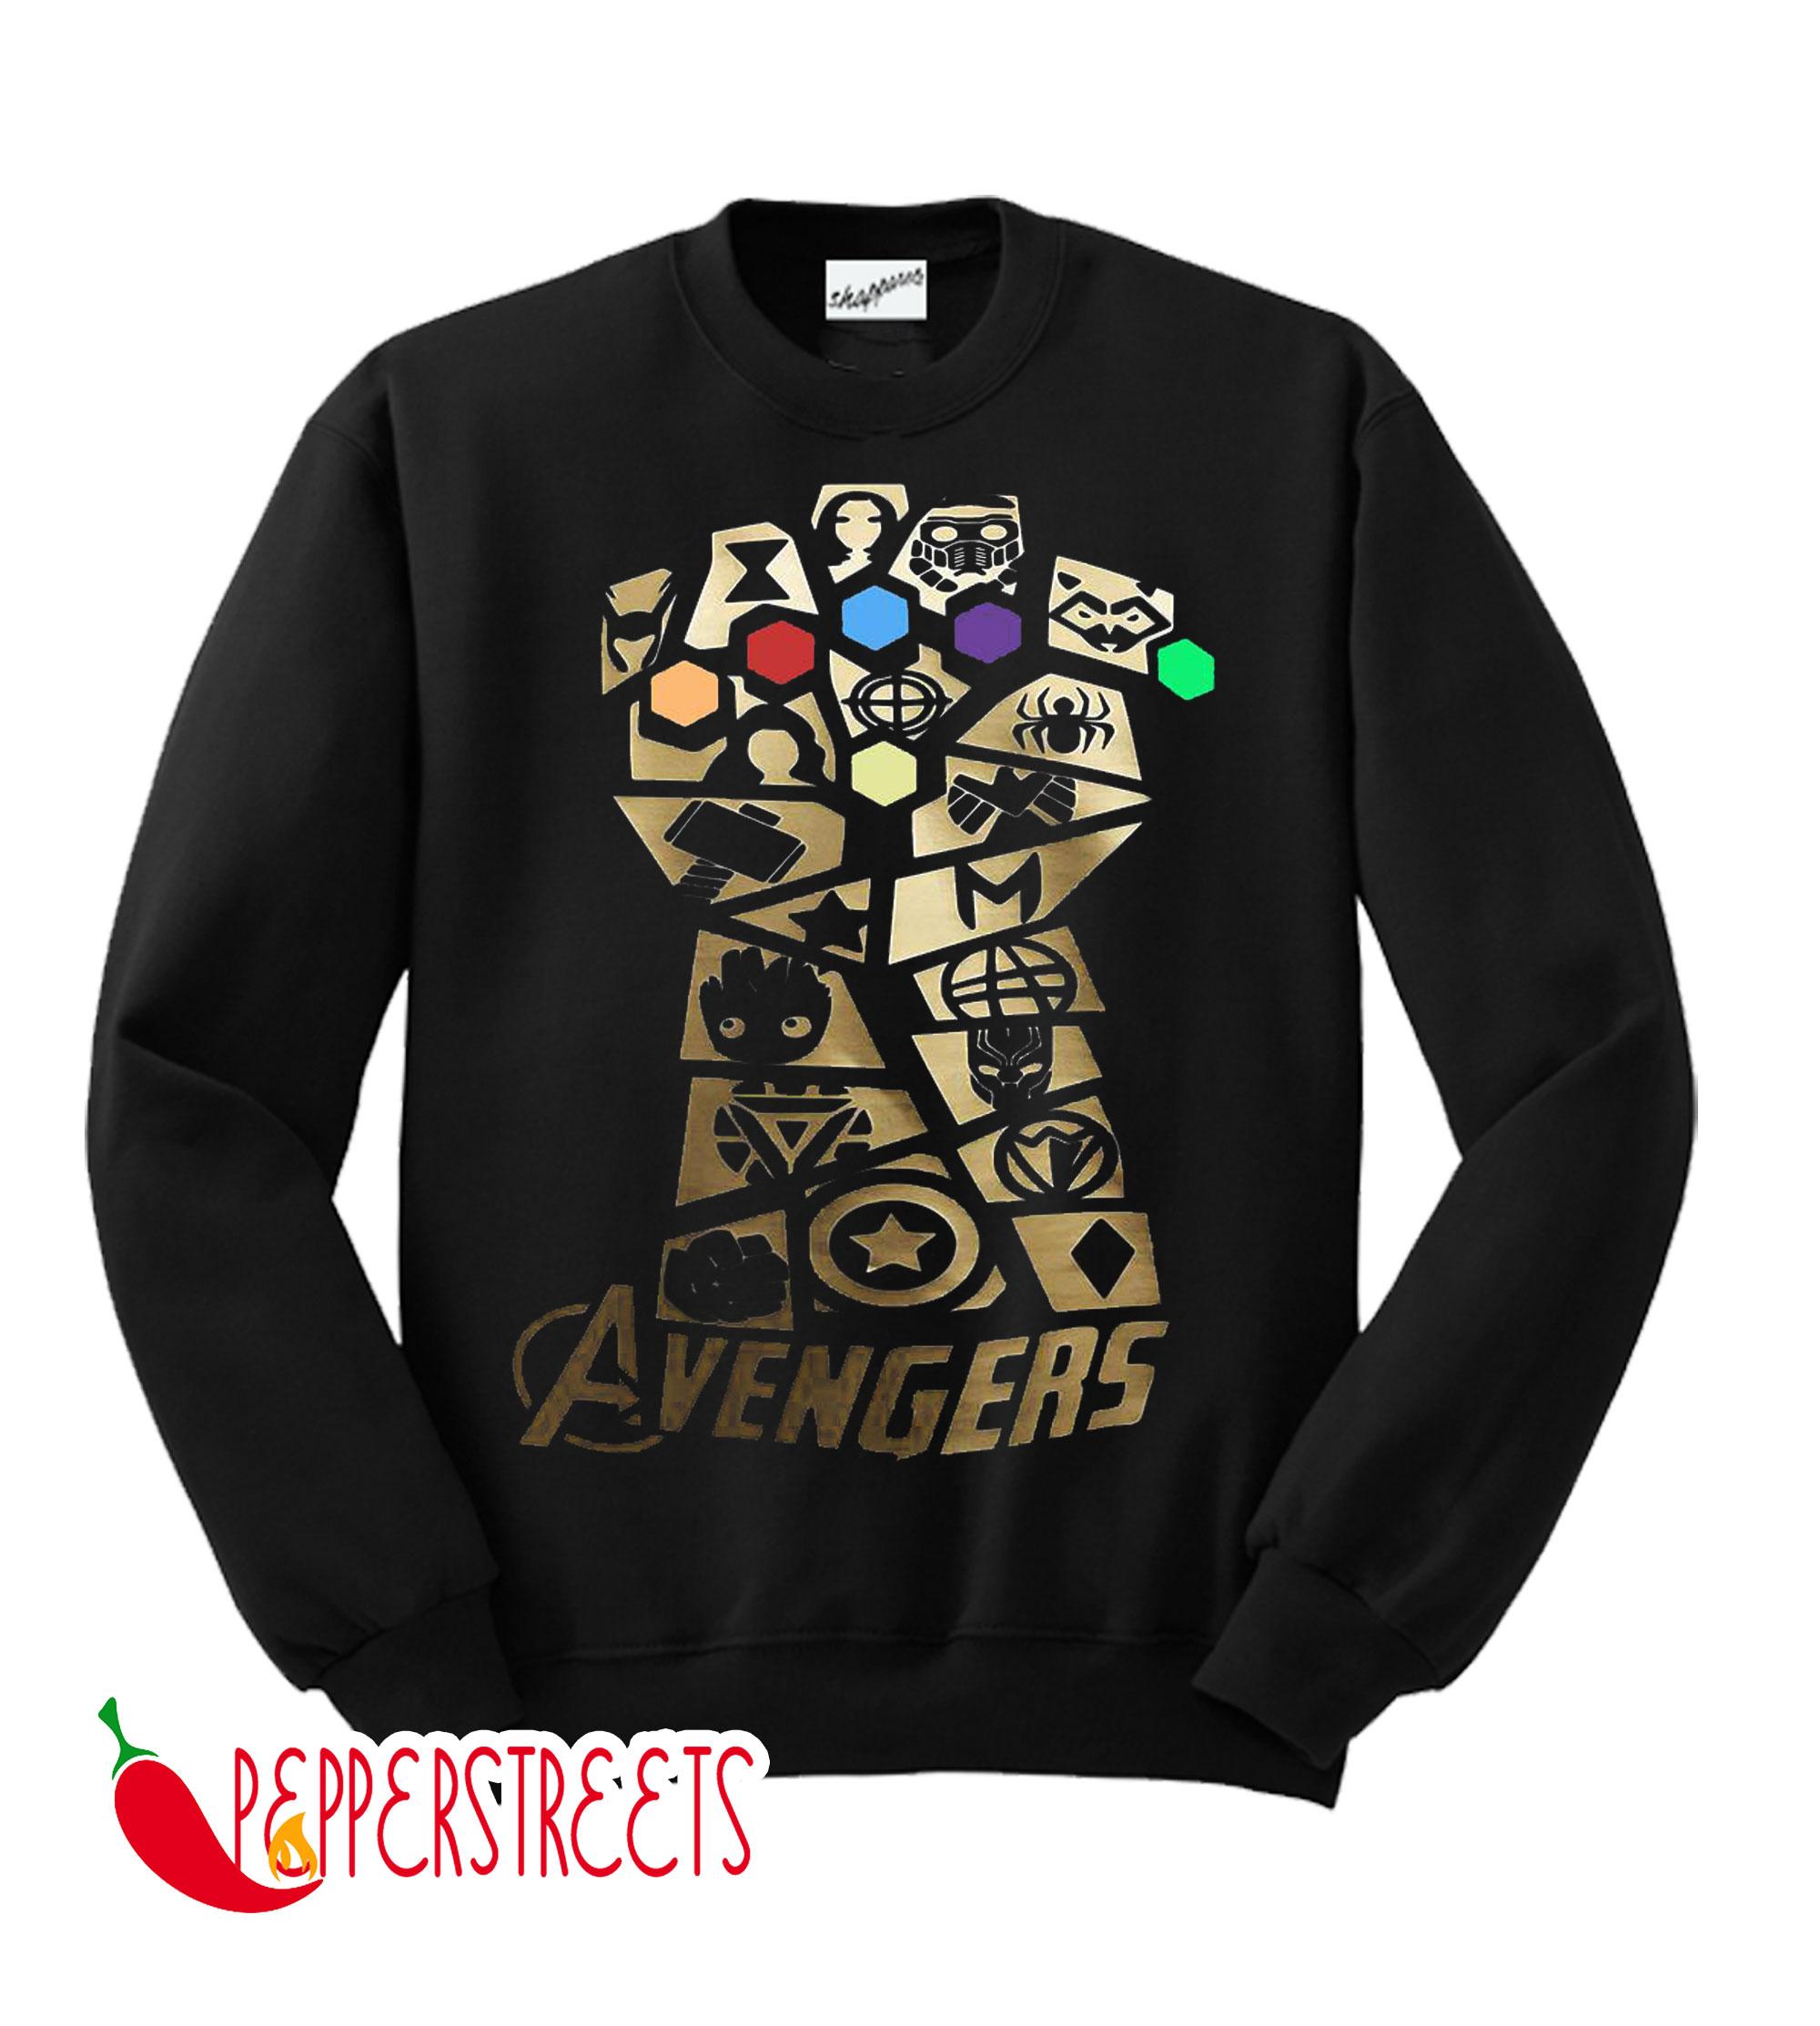 Infinity Gauntlet Thanos Marvel Avengers Endgame Sweatshirt